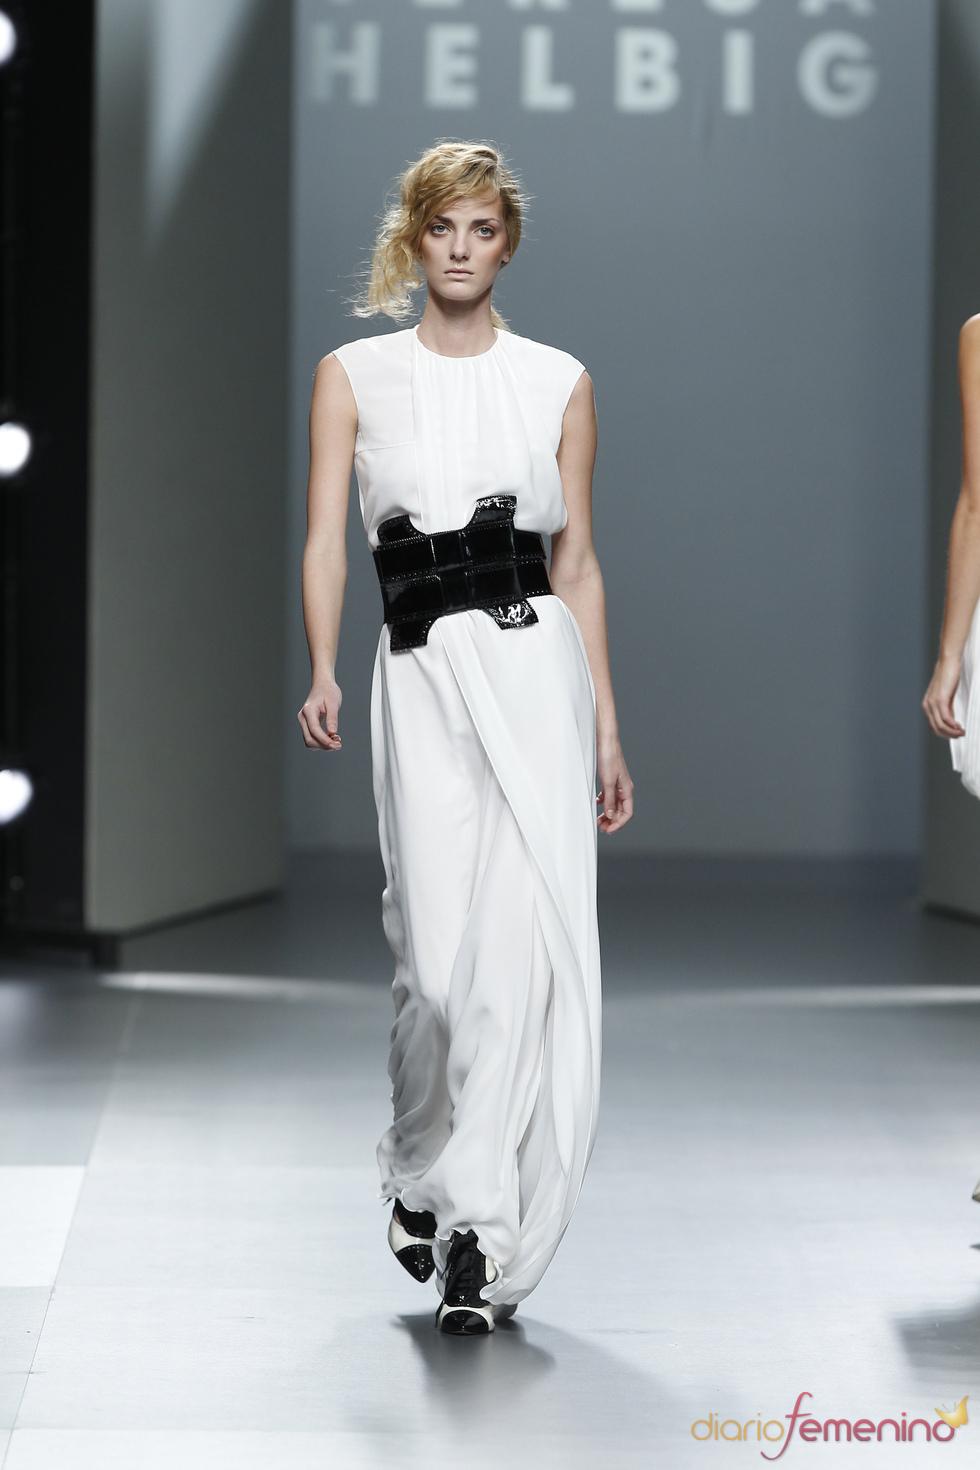 Vestido blanco con cinturon negro.Teresa Helbig O/I 2011-12. Cibeles Madrid Fashion Week